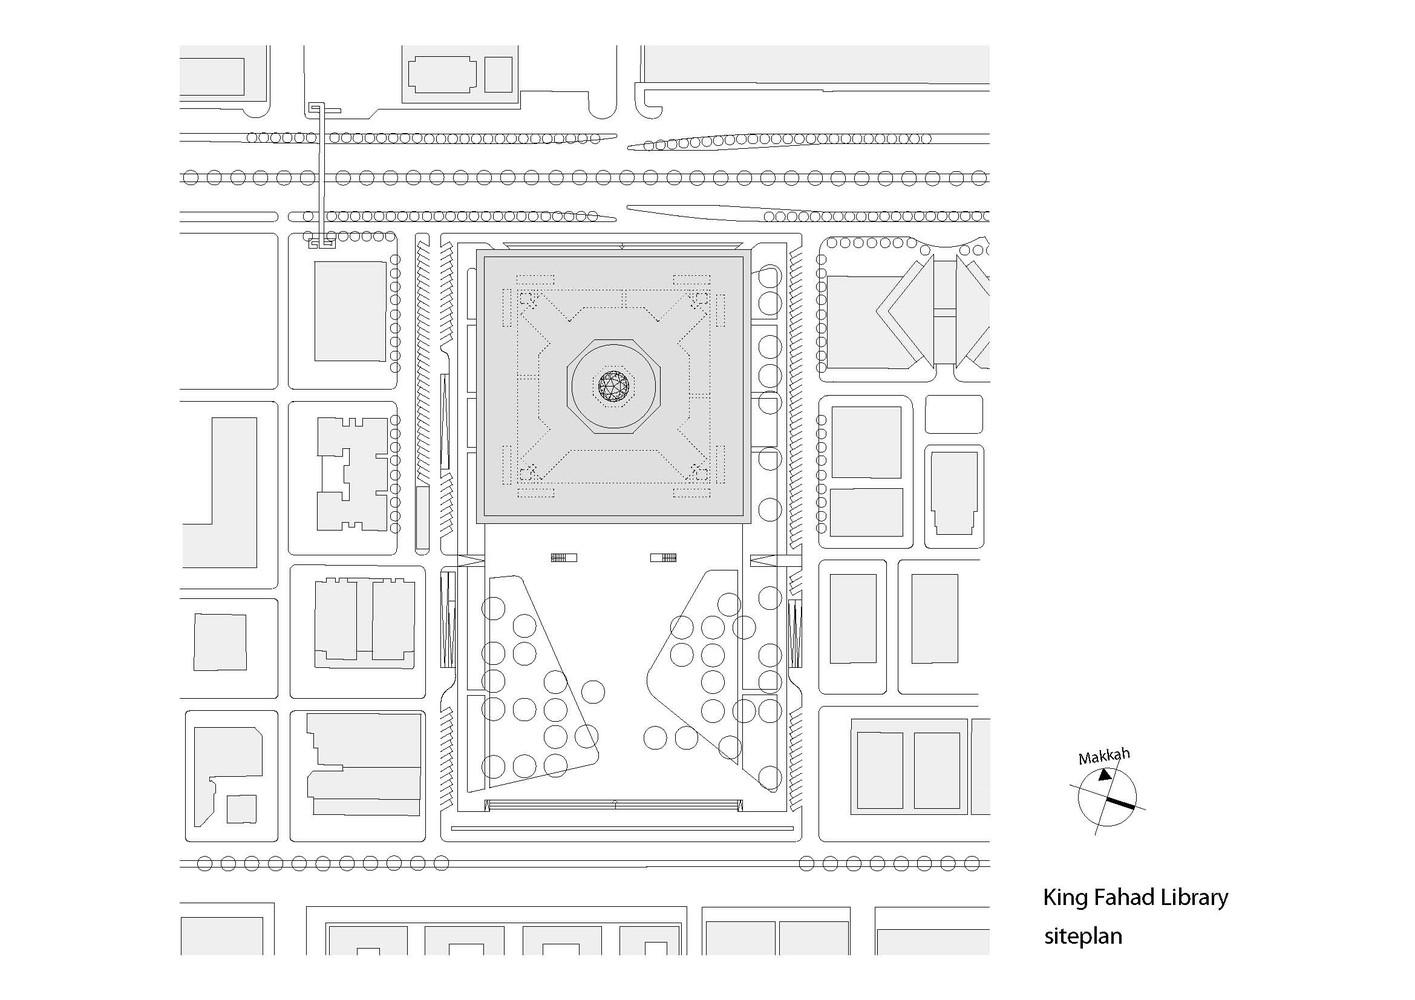 small resolution of 1965 impala 2 speed wiper motor wiring king fahad national library floor plan